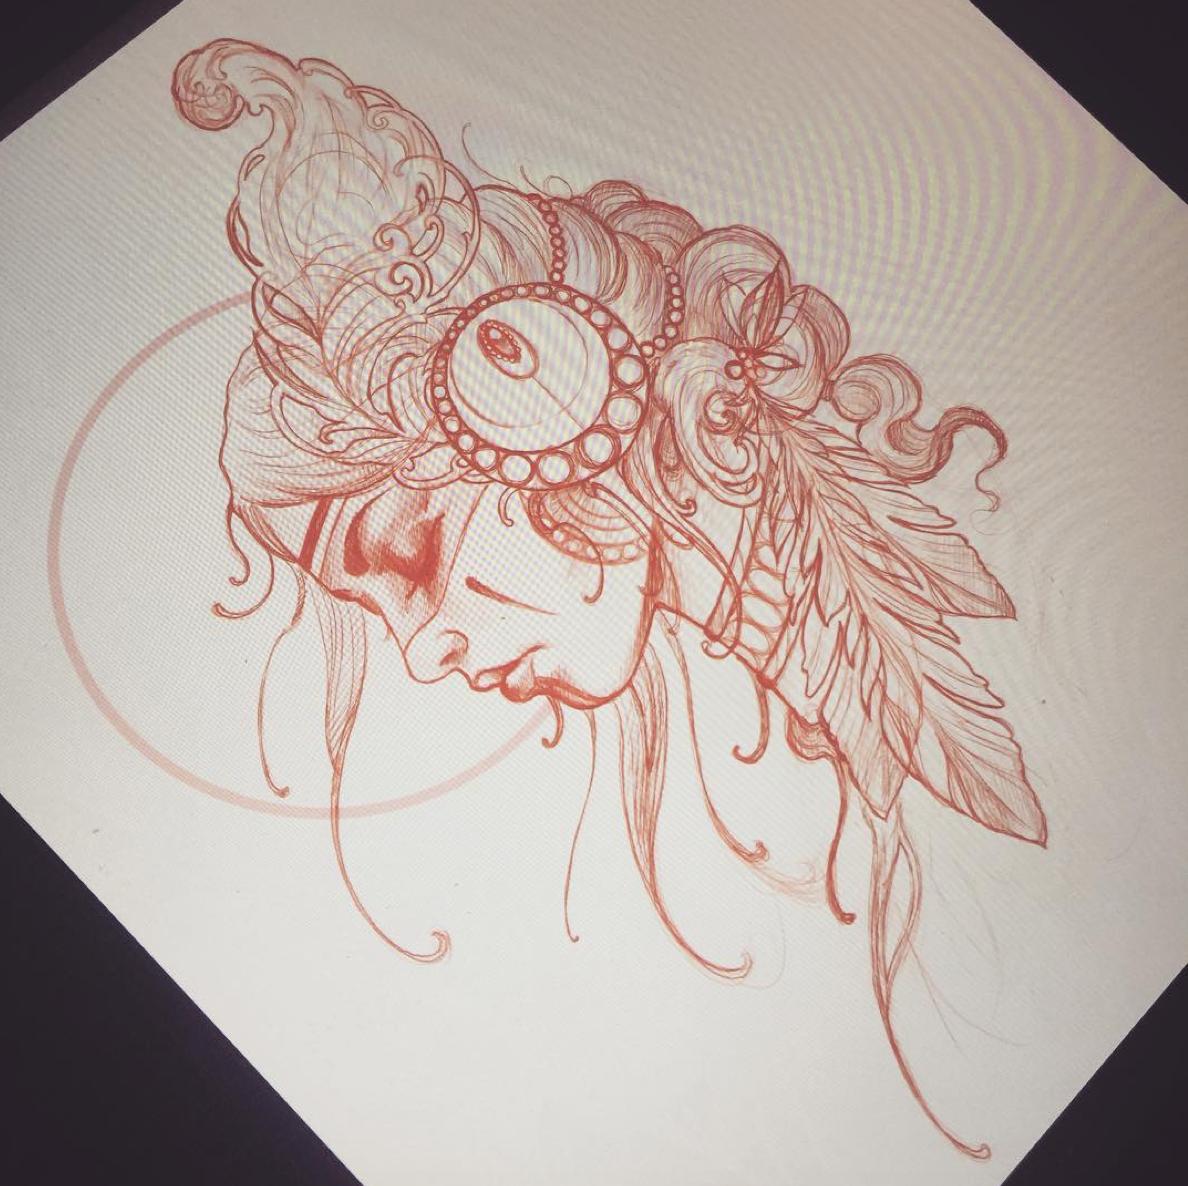 gypsy tattoo neo traditional